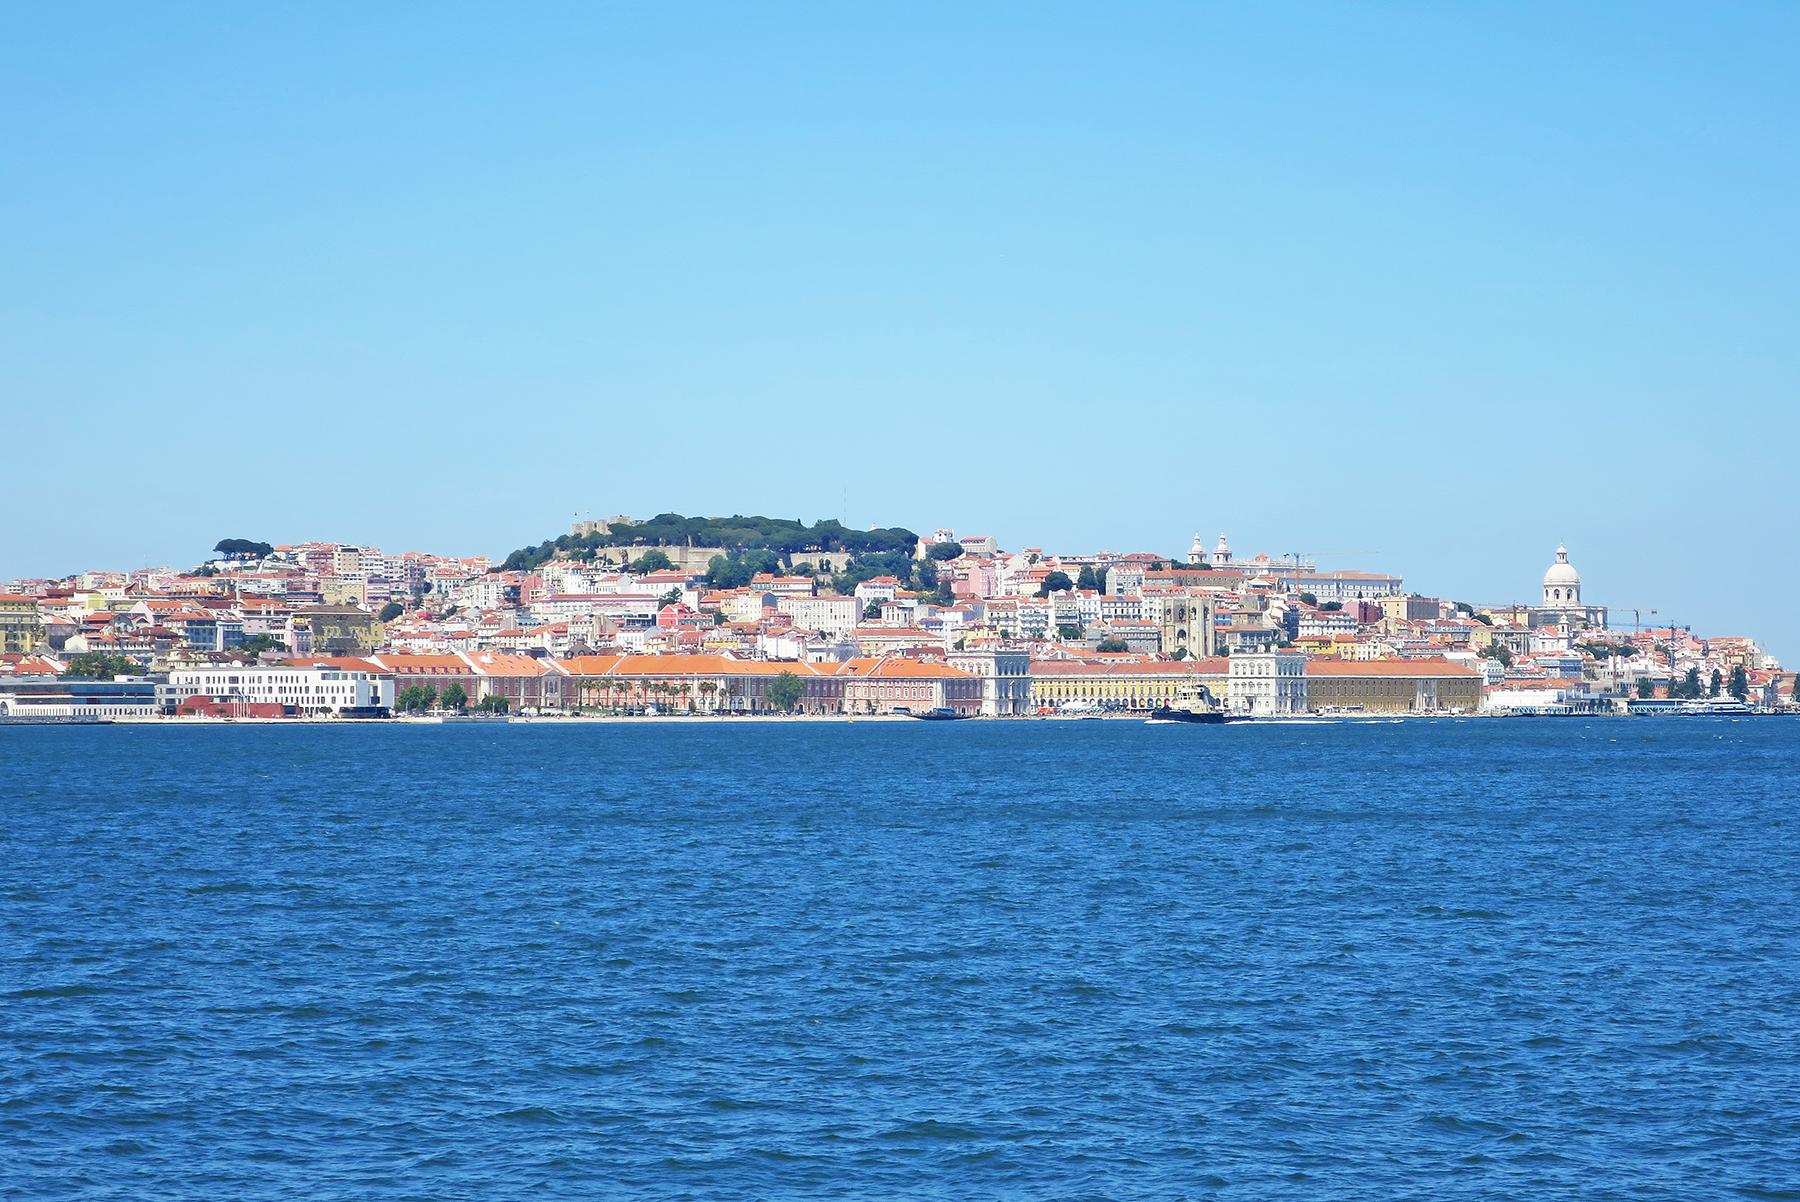 Fado, Fliesen und Fischkonserven: Liebeserklärung an Lissabon